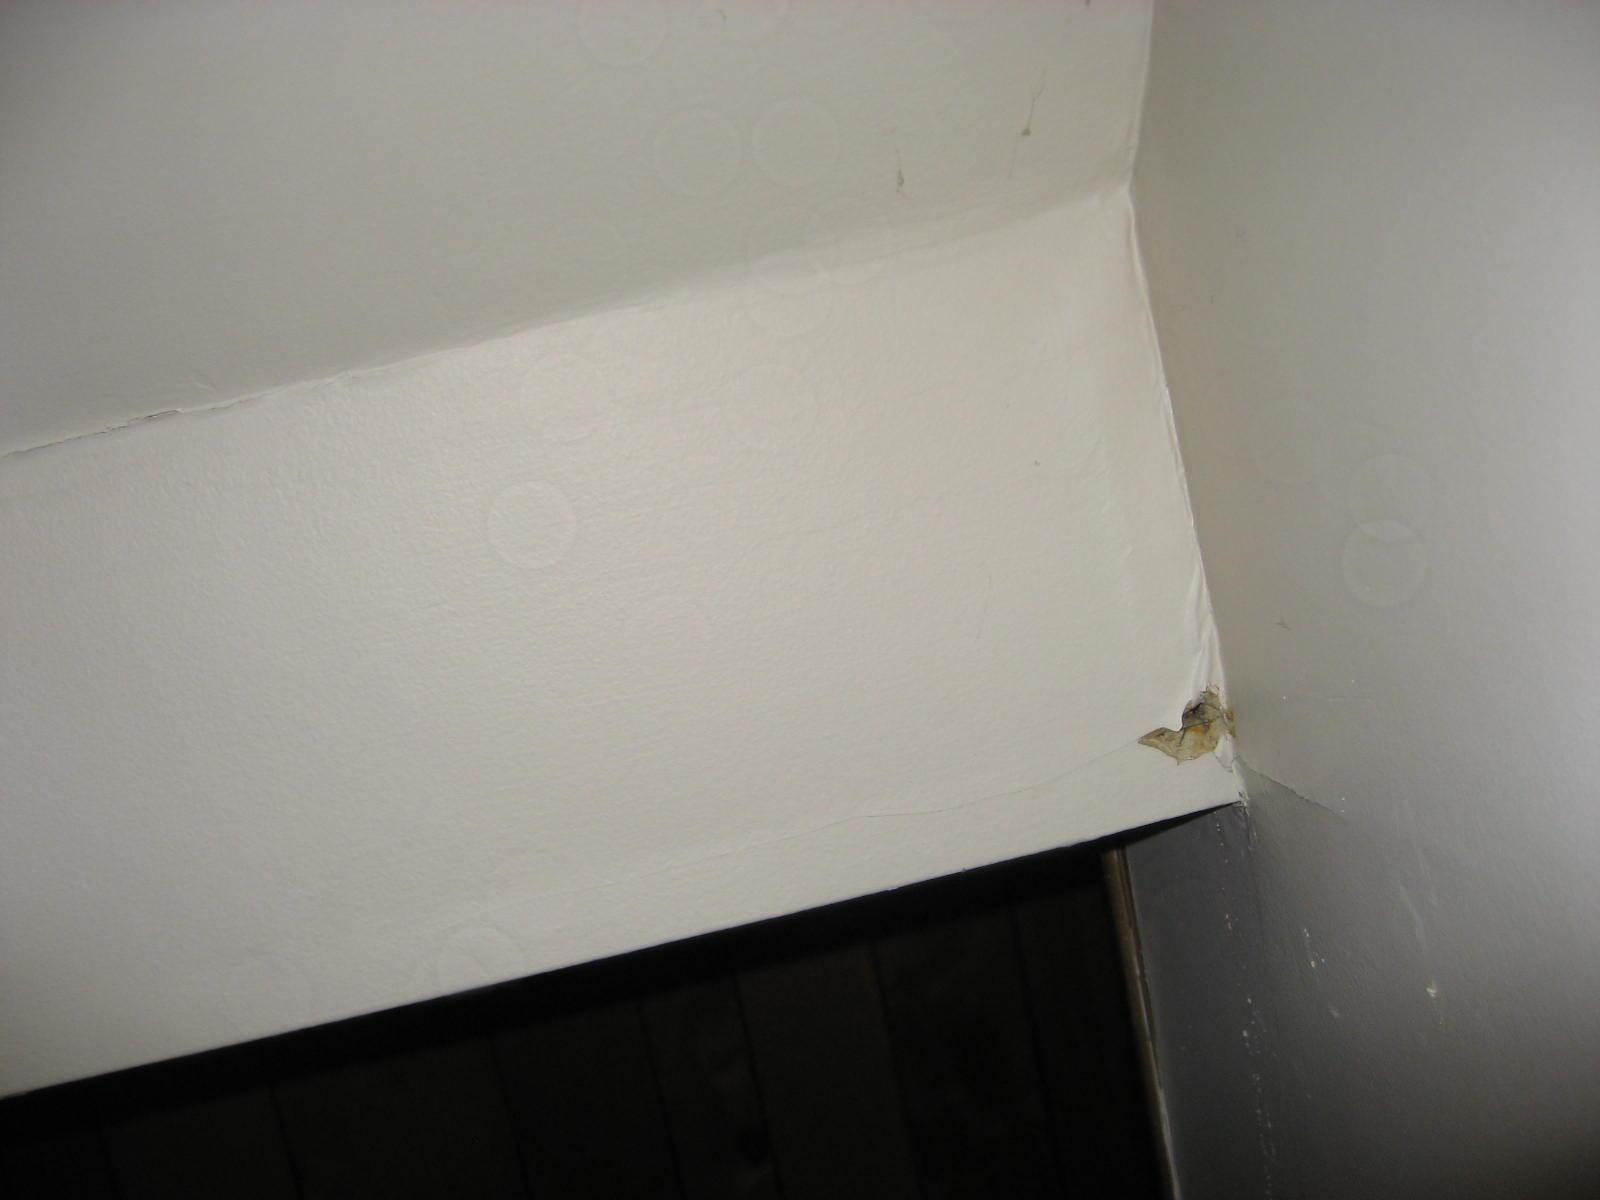 Plumbing vent (Stack) leak-221.jpg